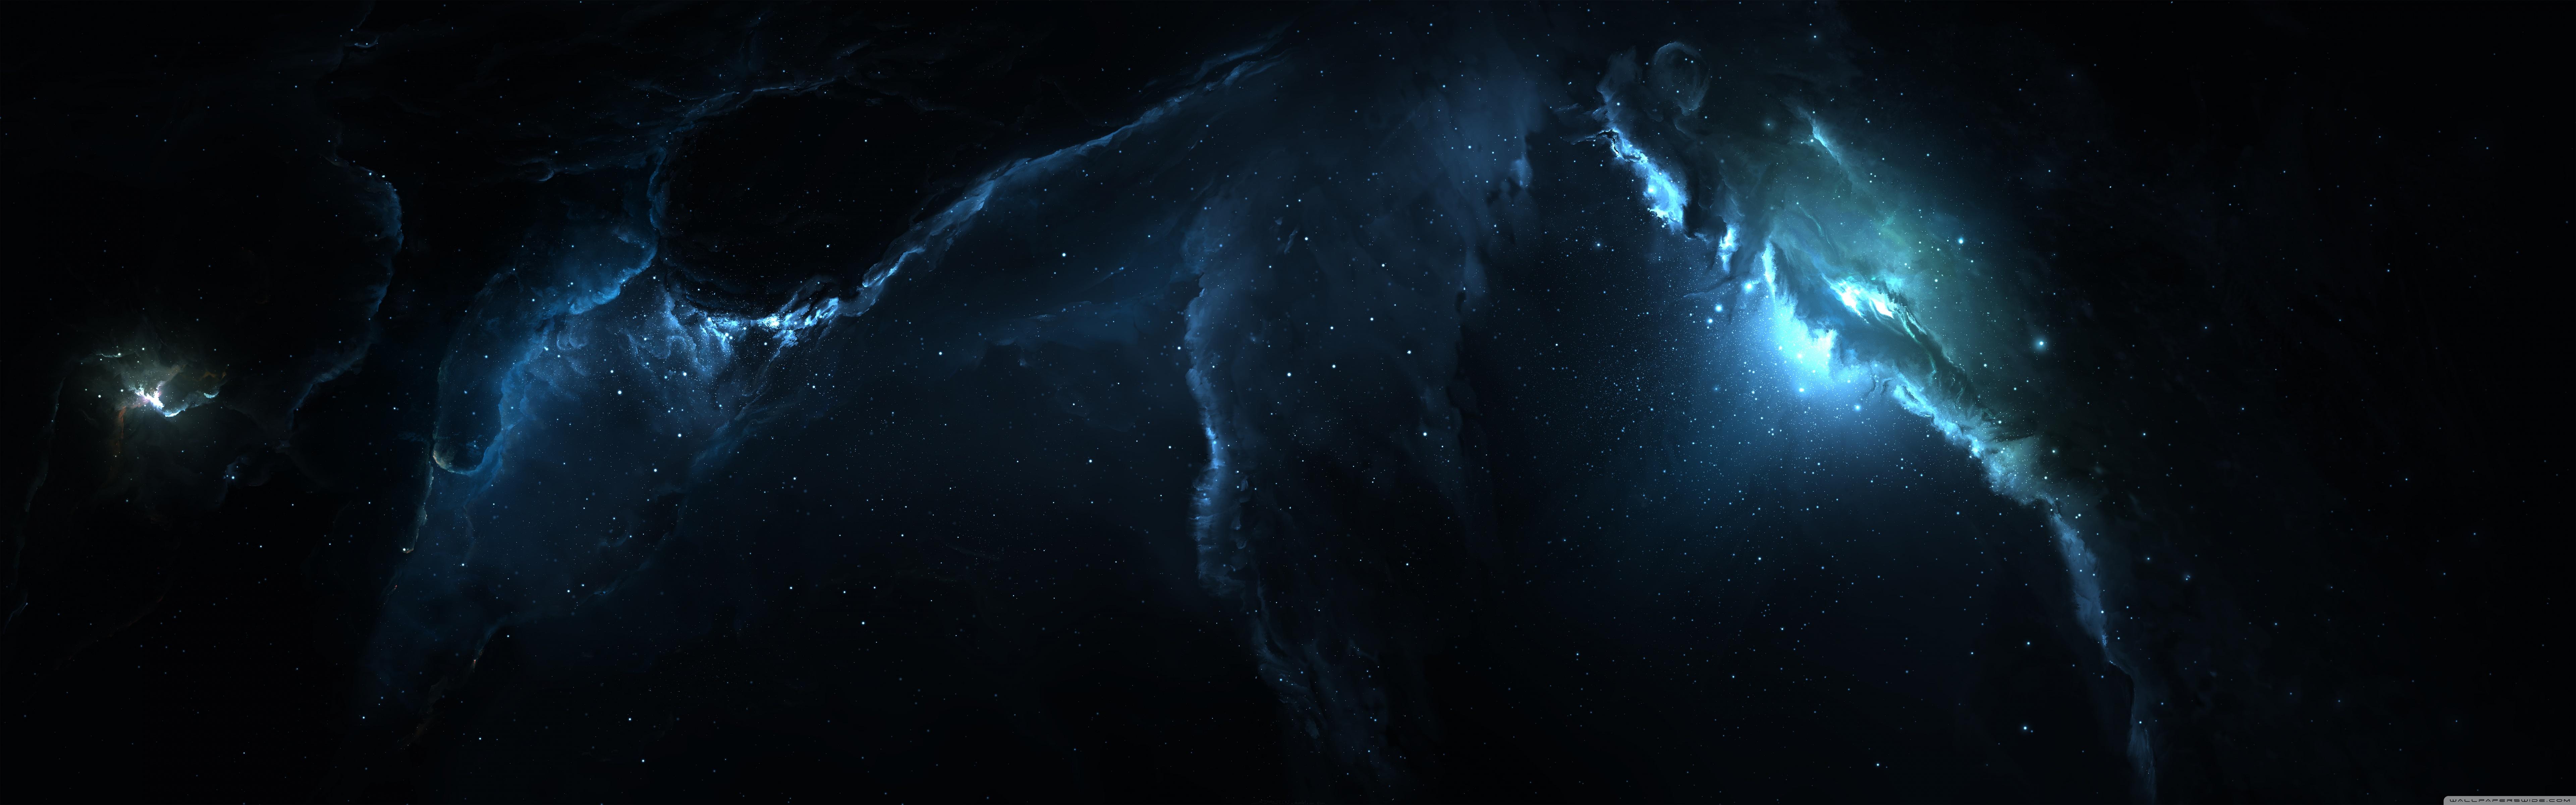 Nebula 3 Dual Monitor Wallpaper Full HD [7680x2400] - Free wallpaper ...